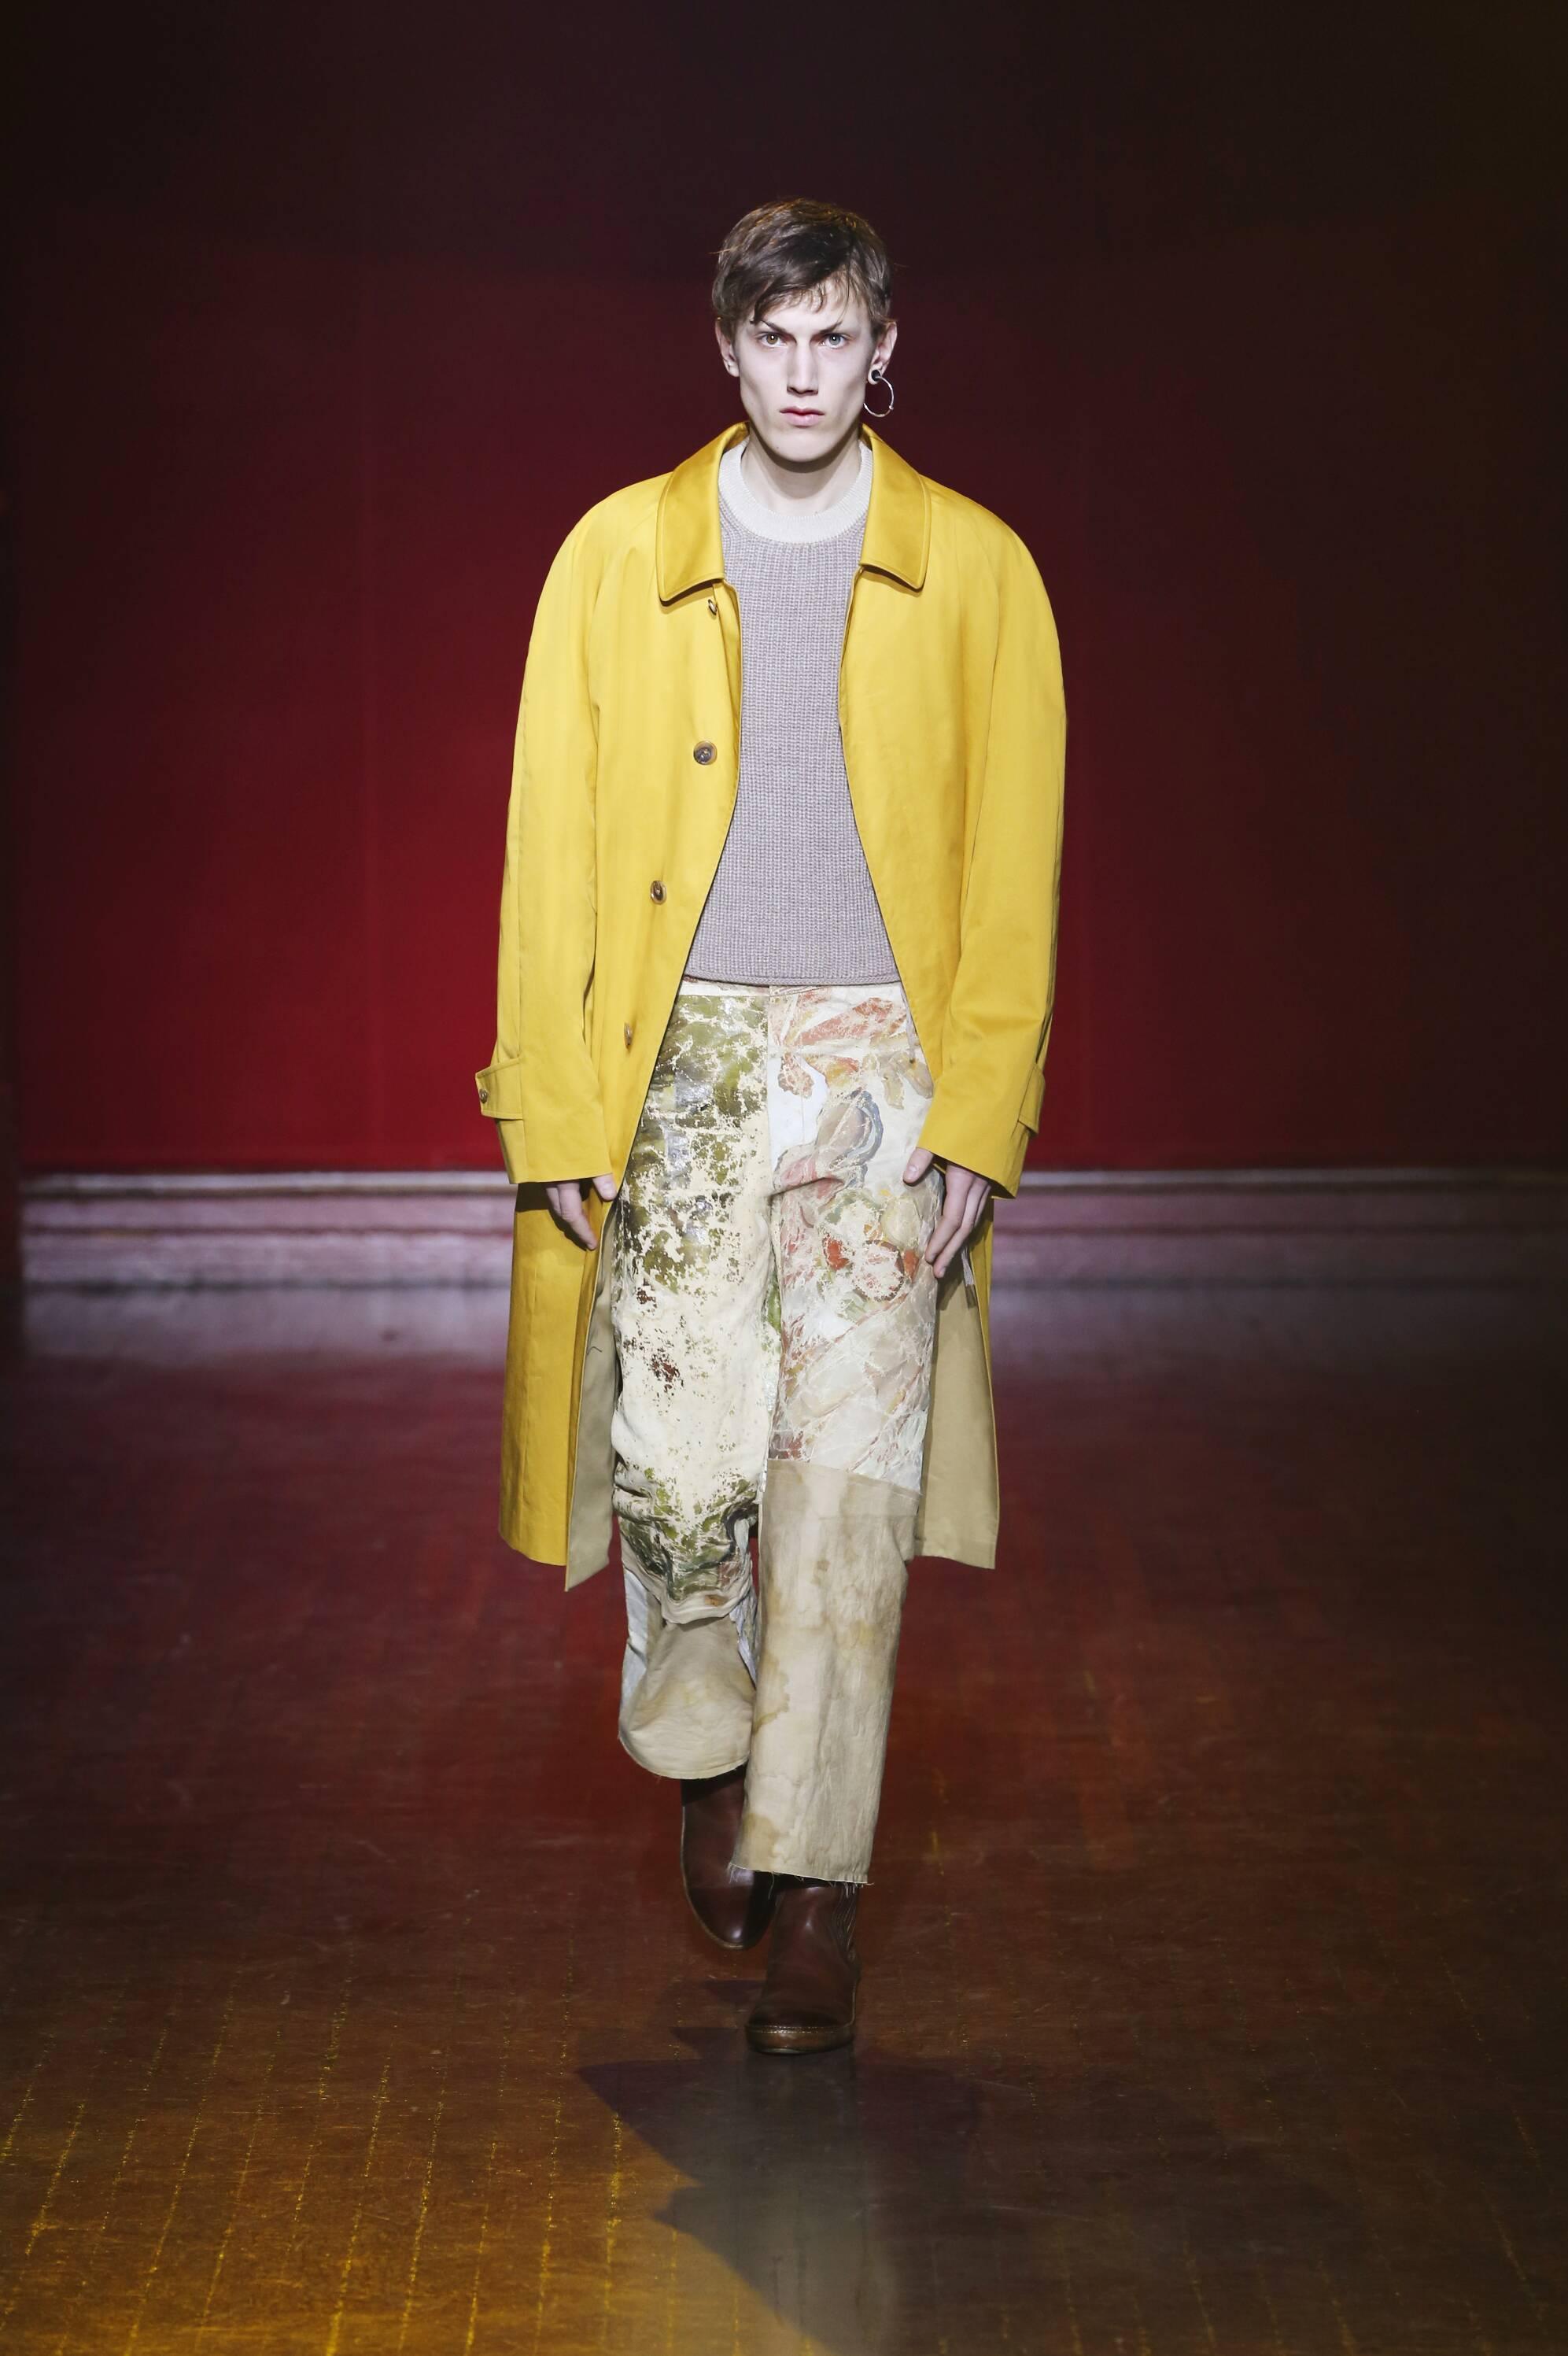 Fashion Man Model Maison Margiela Collection Catwalk